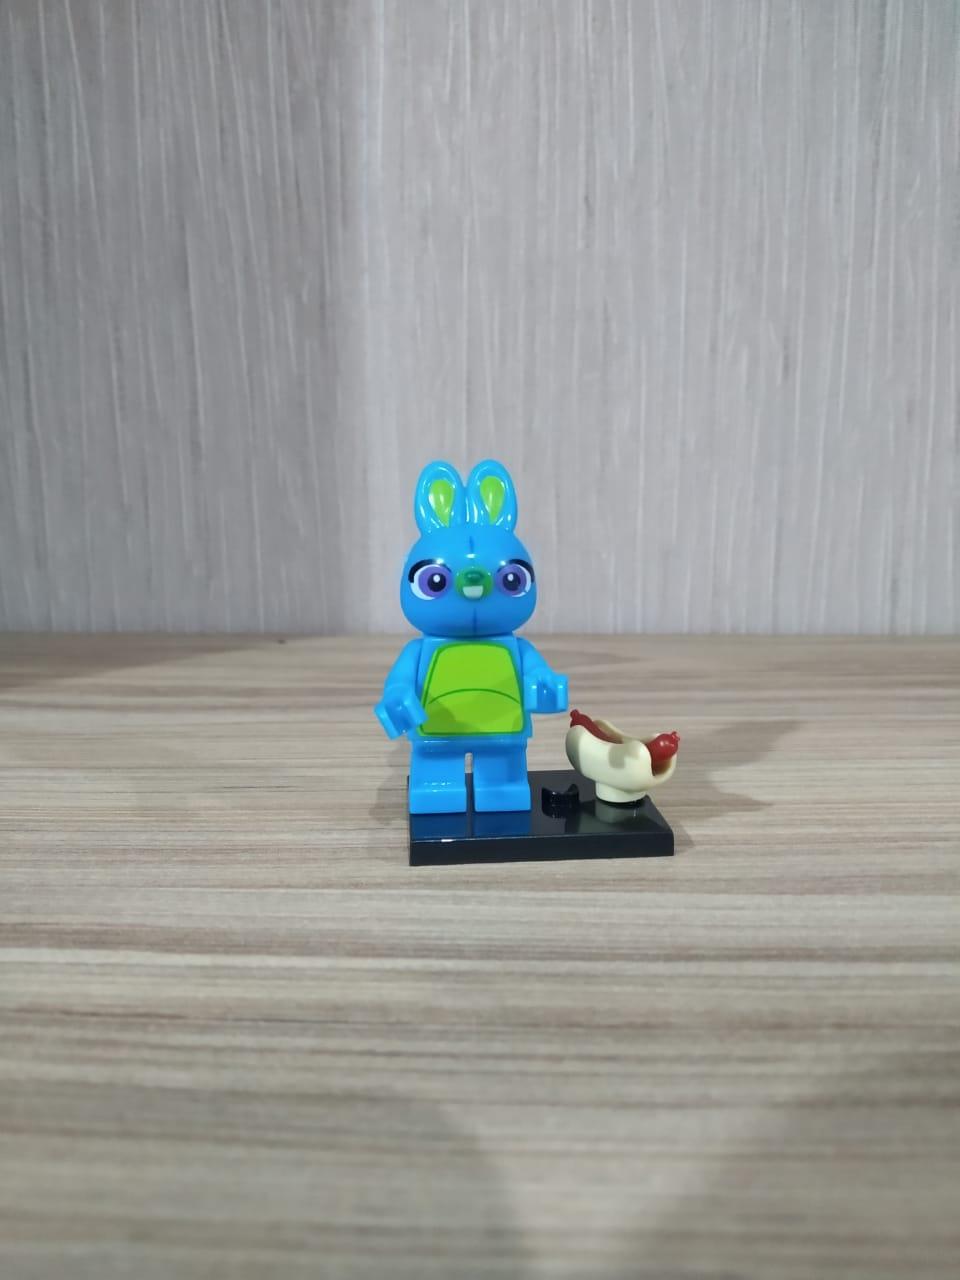 LEGO: Bunny - Toy Story